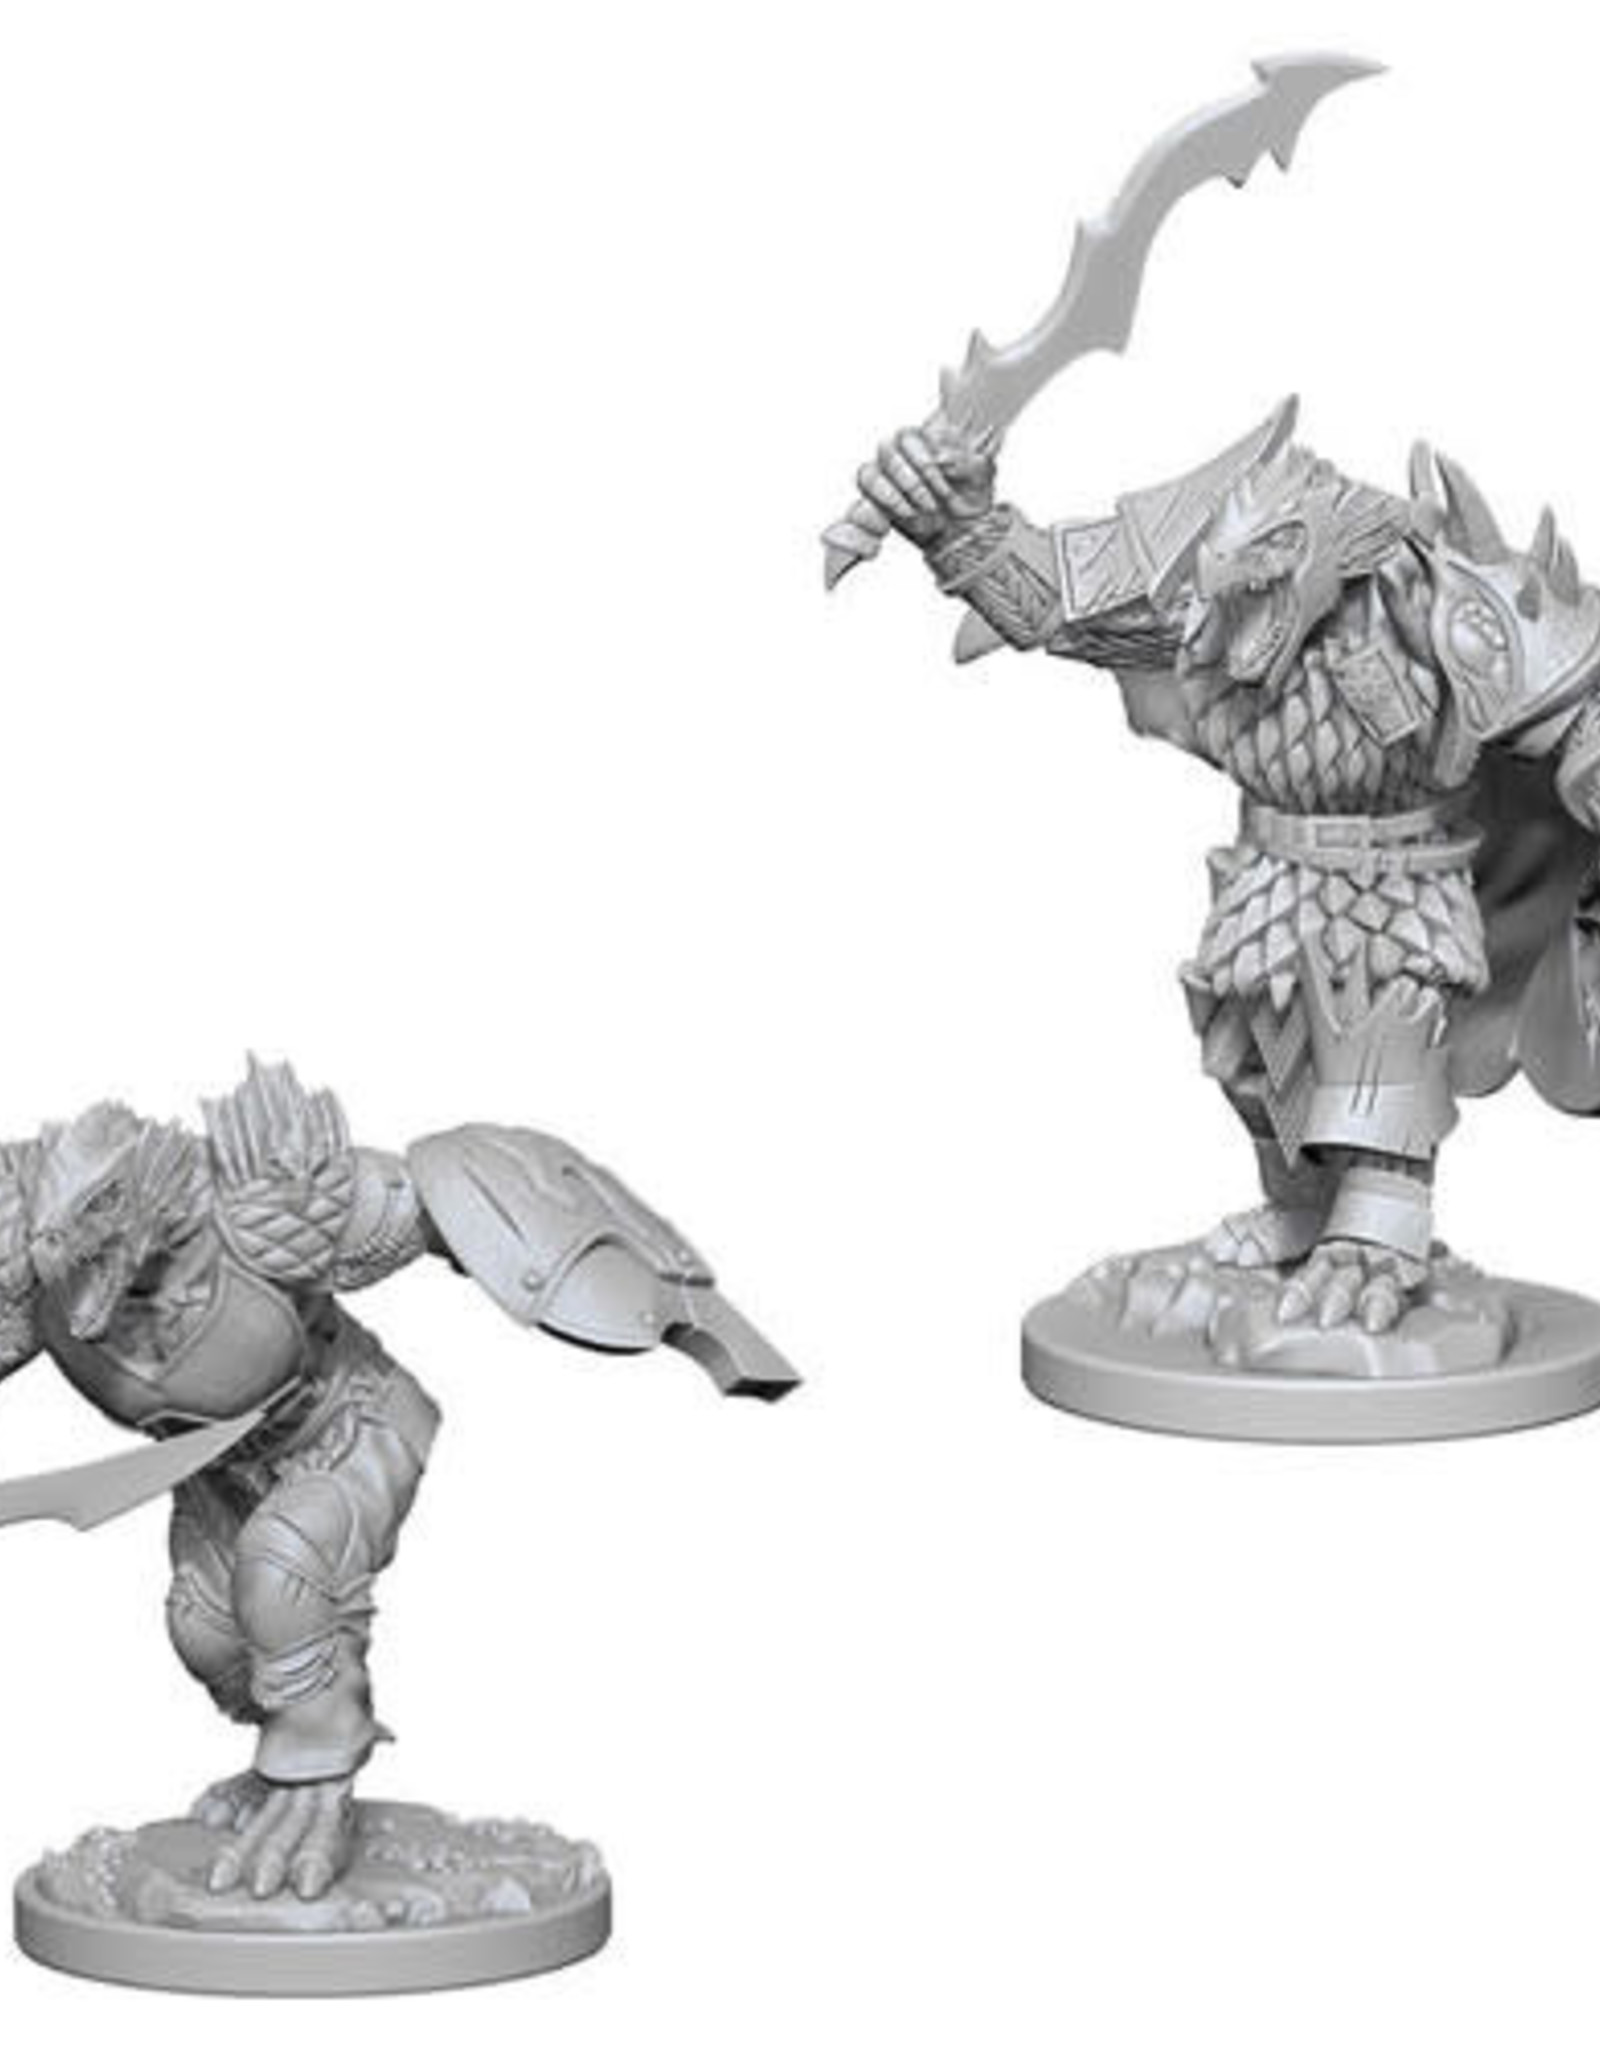 WizKids D&D Nolzur Dragonborn Fighter  (He/Him/They/Them)